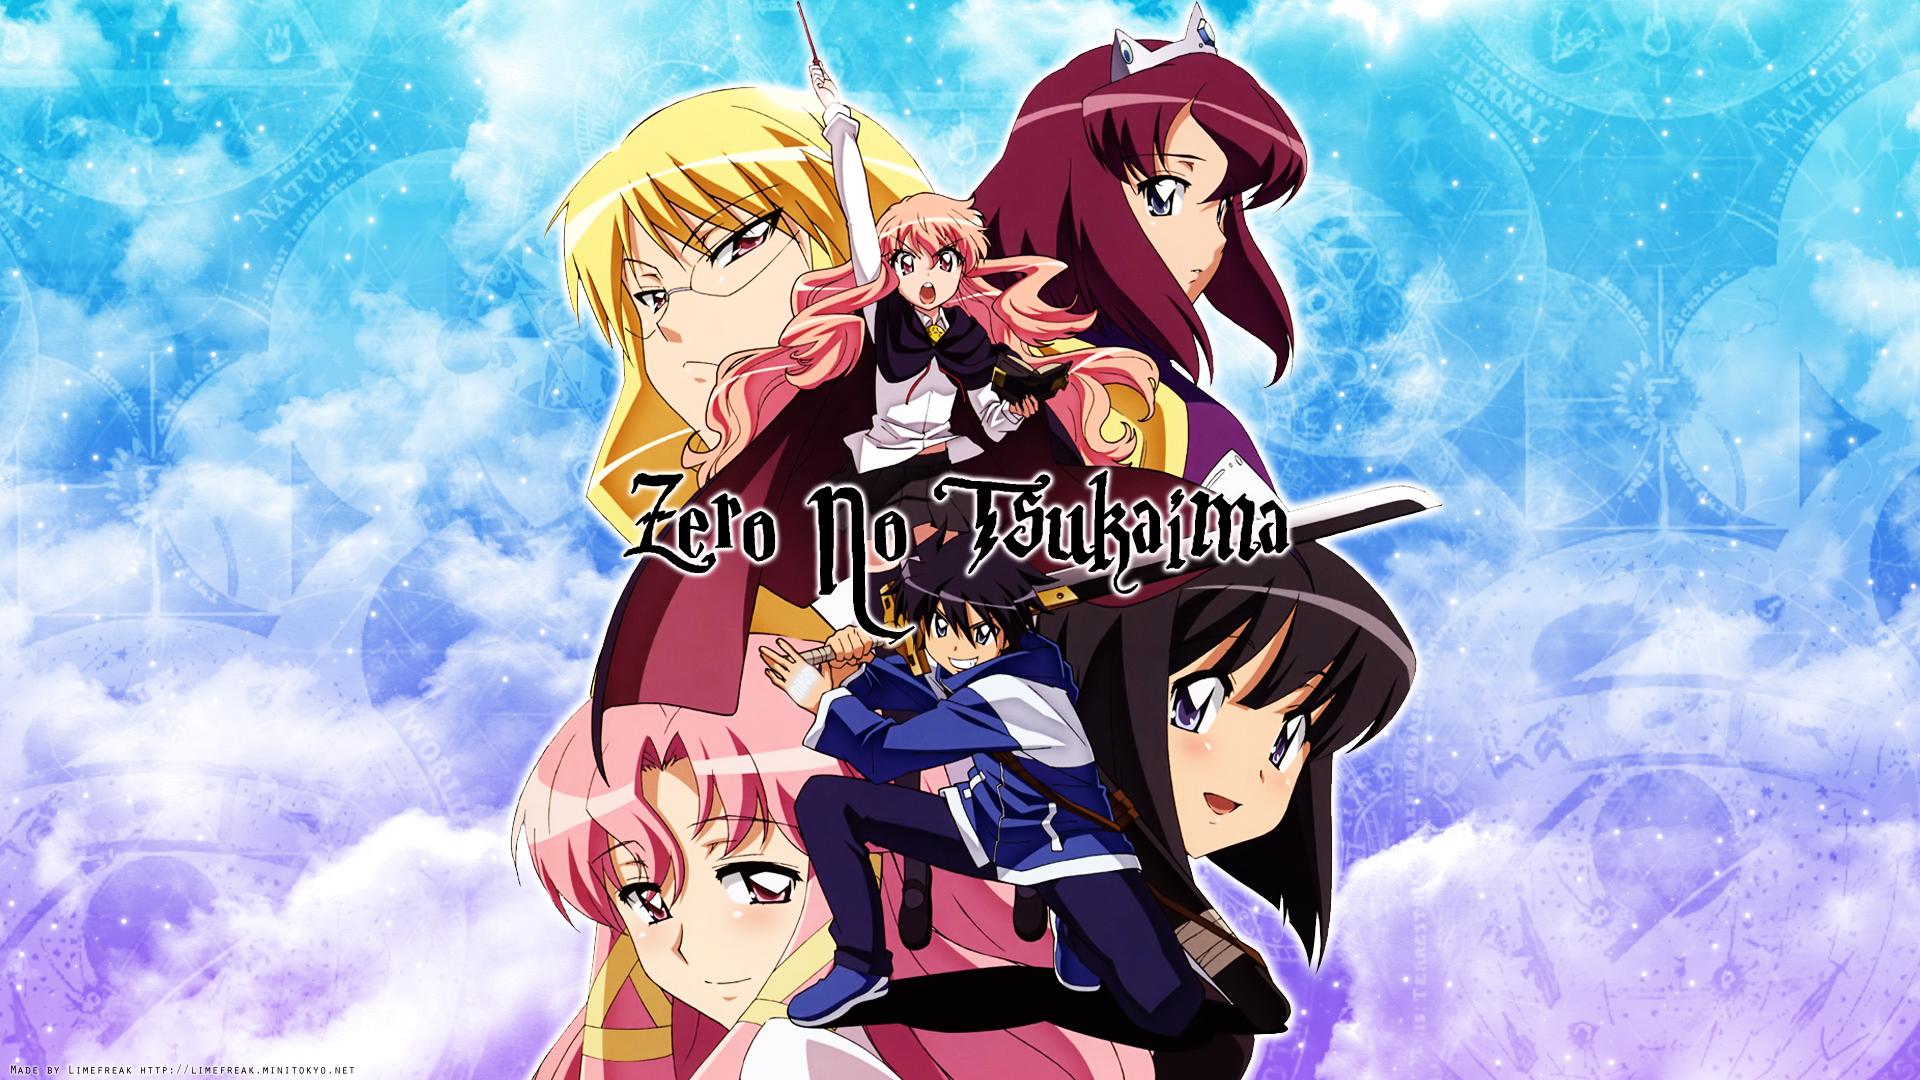 Zero No Tsukaima Pics, Anime Collection